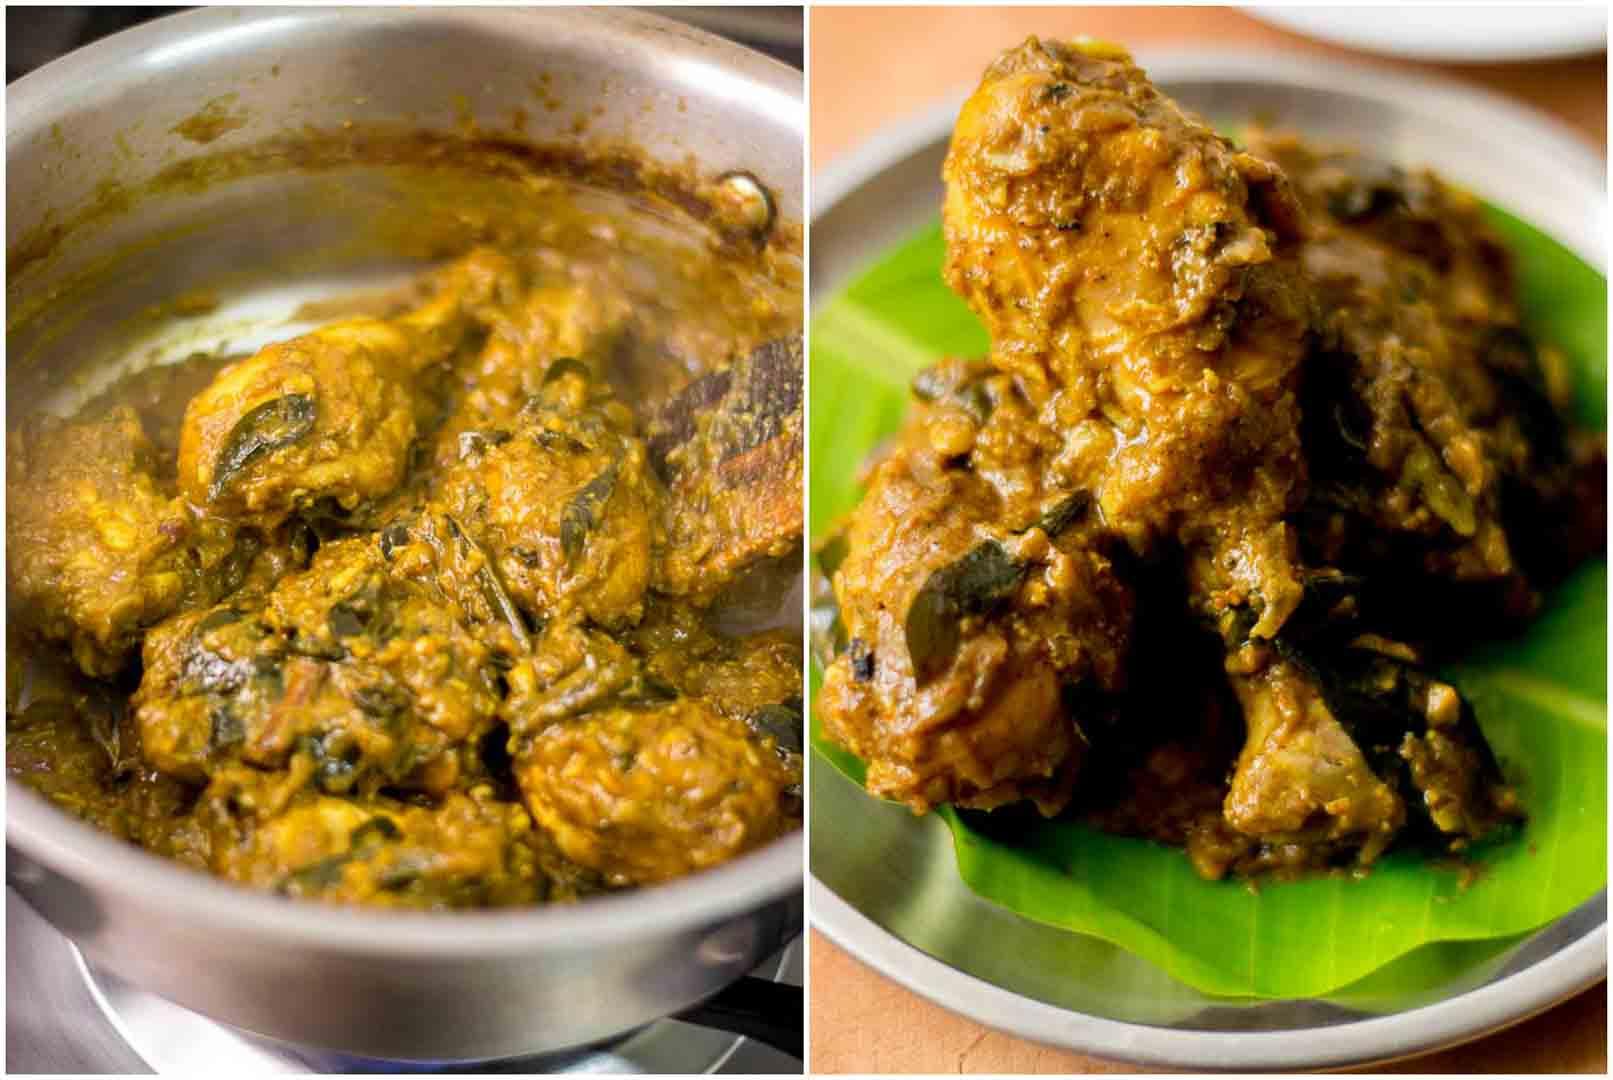 chettinad-chicken-dry-masala-gravy-recipe-15